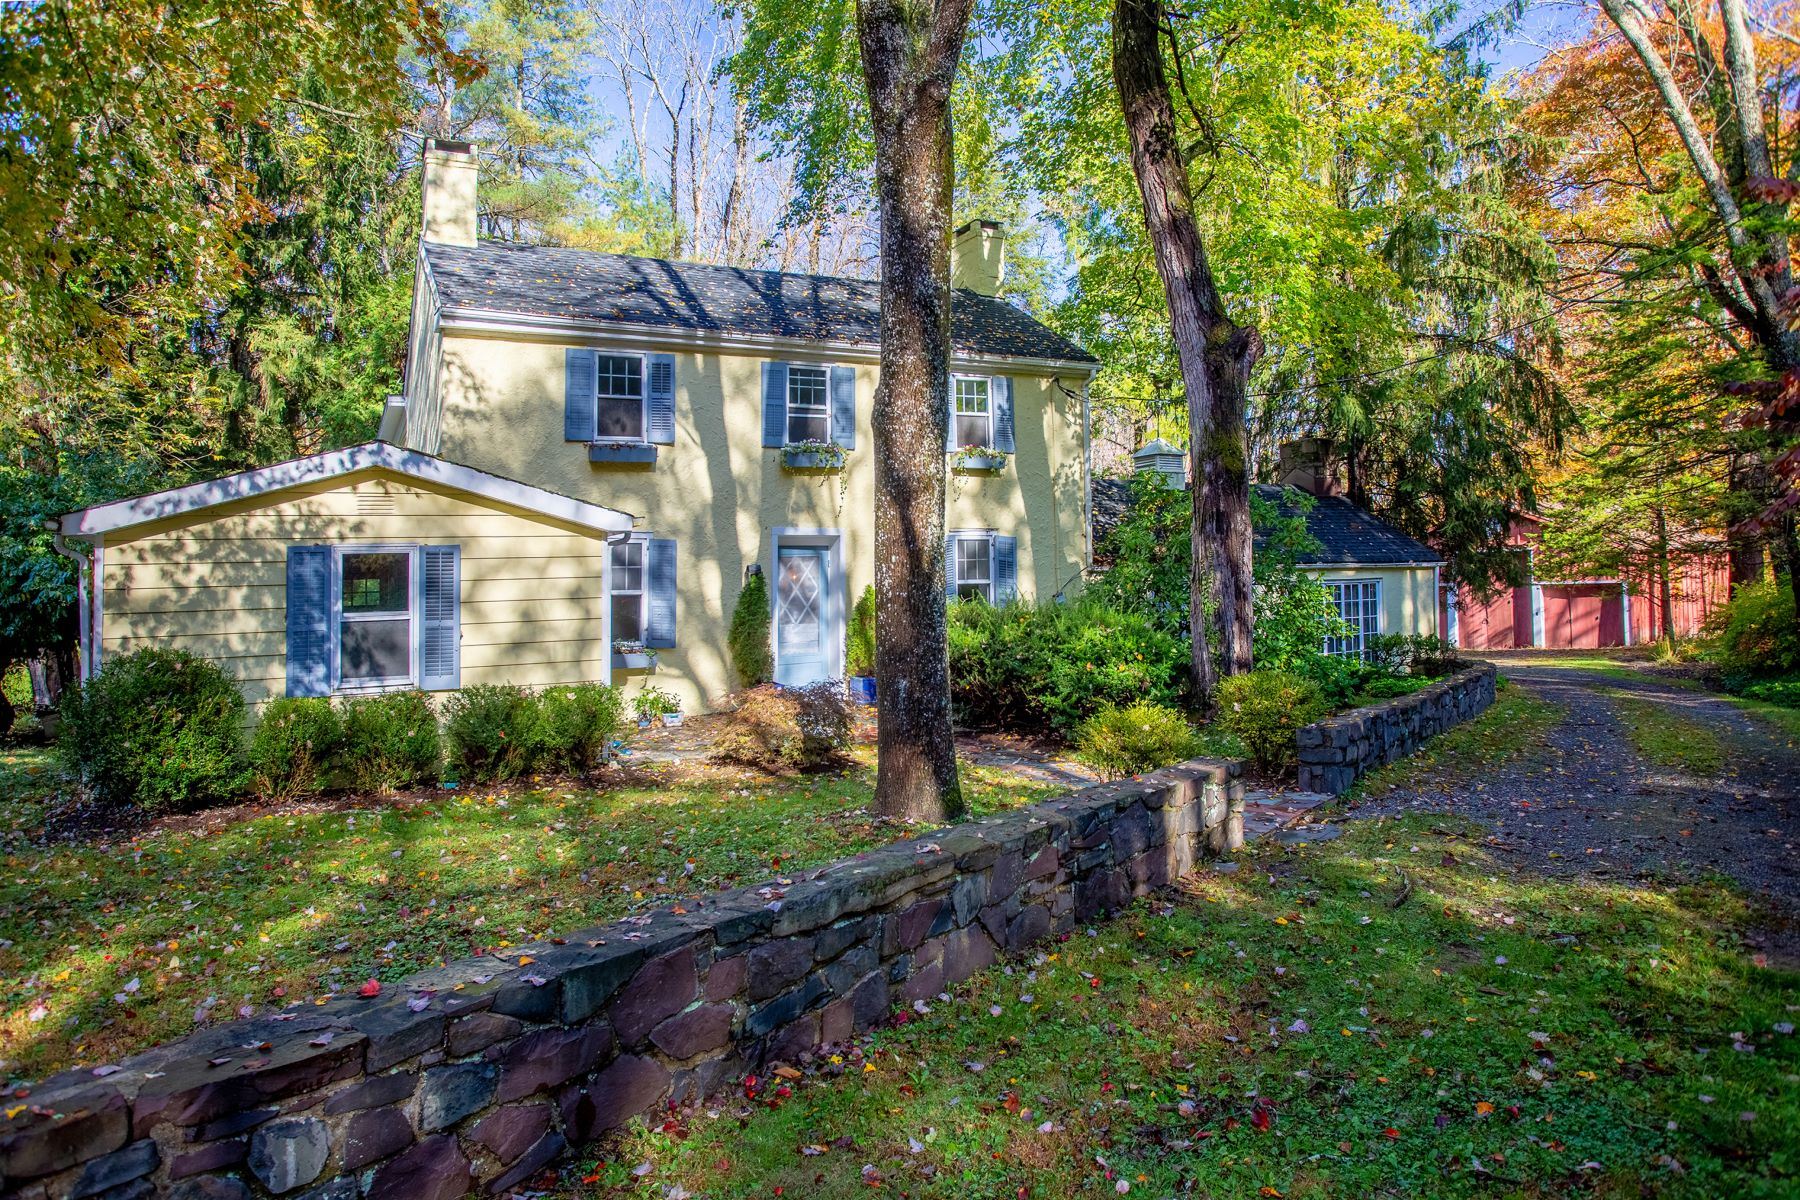 Property 为 销售 在 兰伯特维尔, 新泽西州 08530 美国